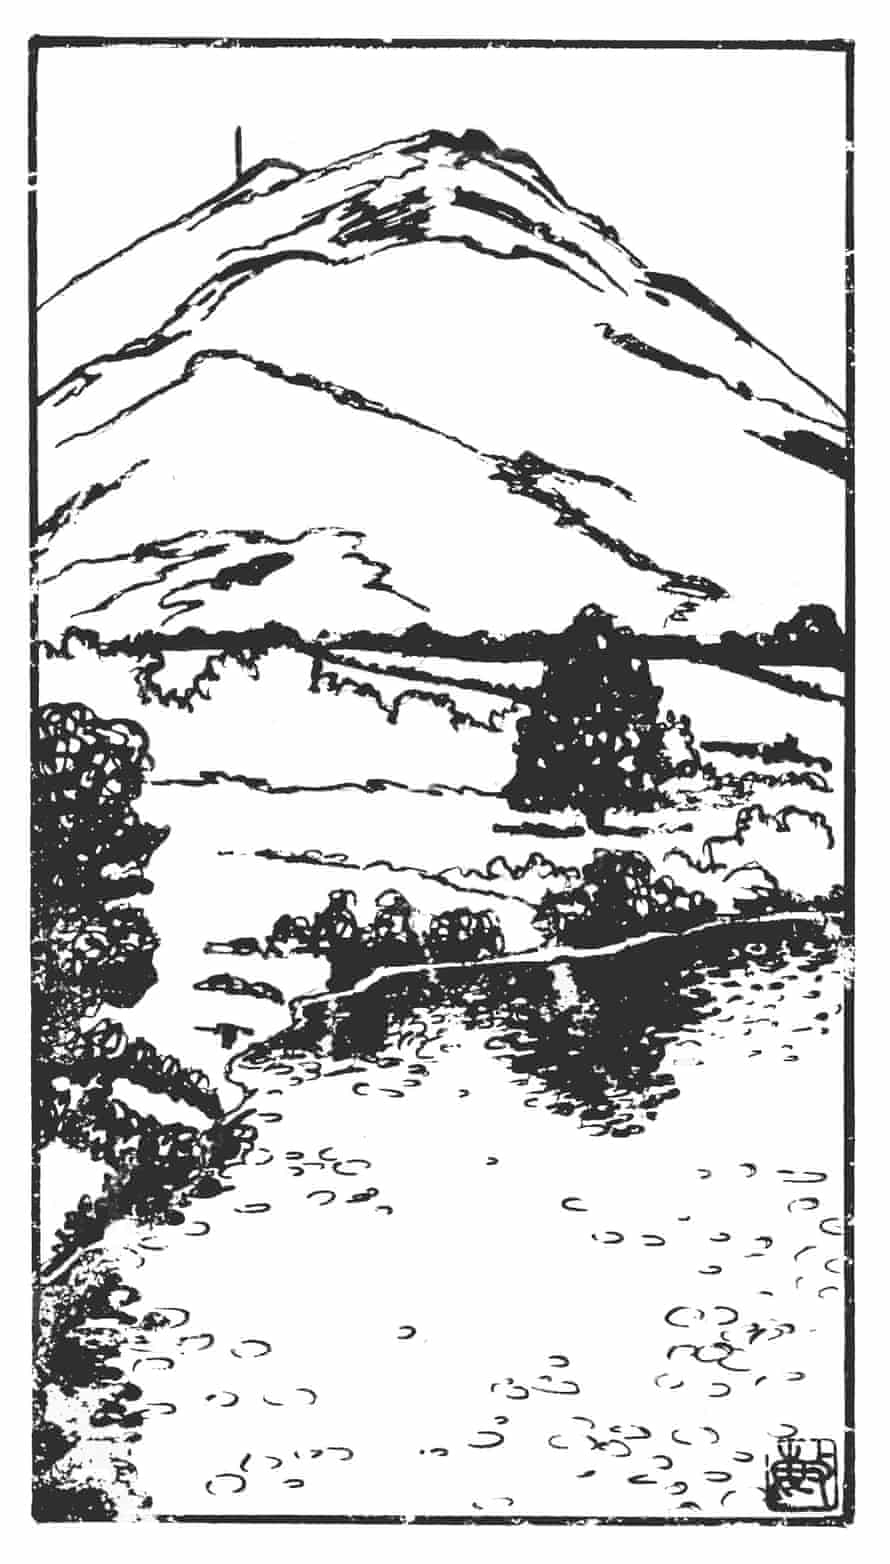 Illustration from Rain.